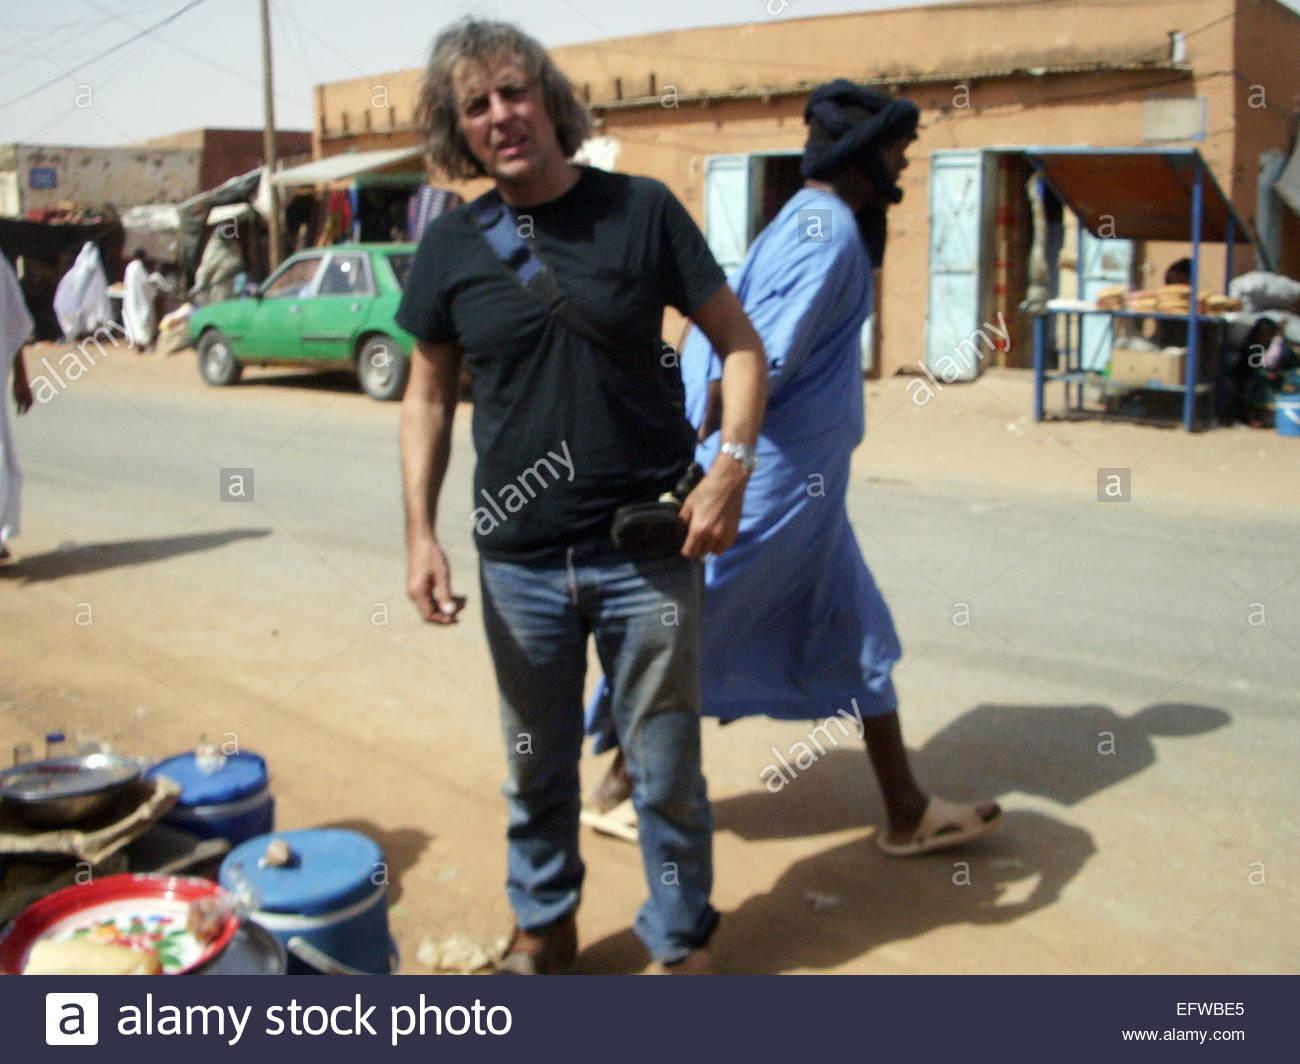 Tuareg Walking Behind Explorer Kypros Real People Person Human Being Africans Arabic Arab Arabs Muslim Caucasian - Stock Image